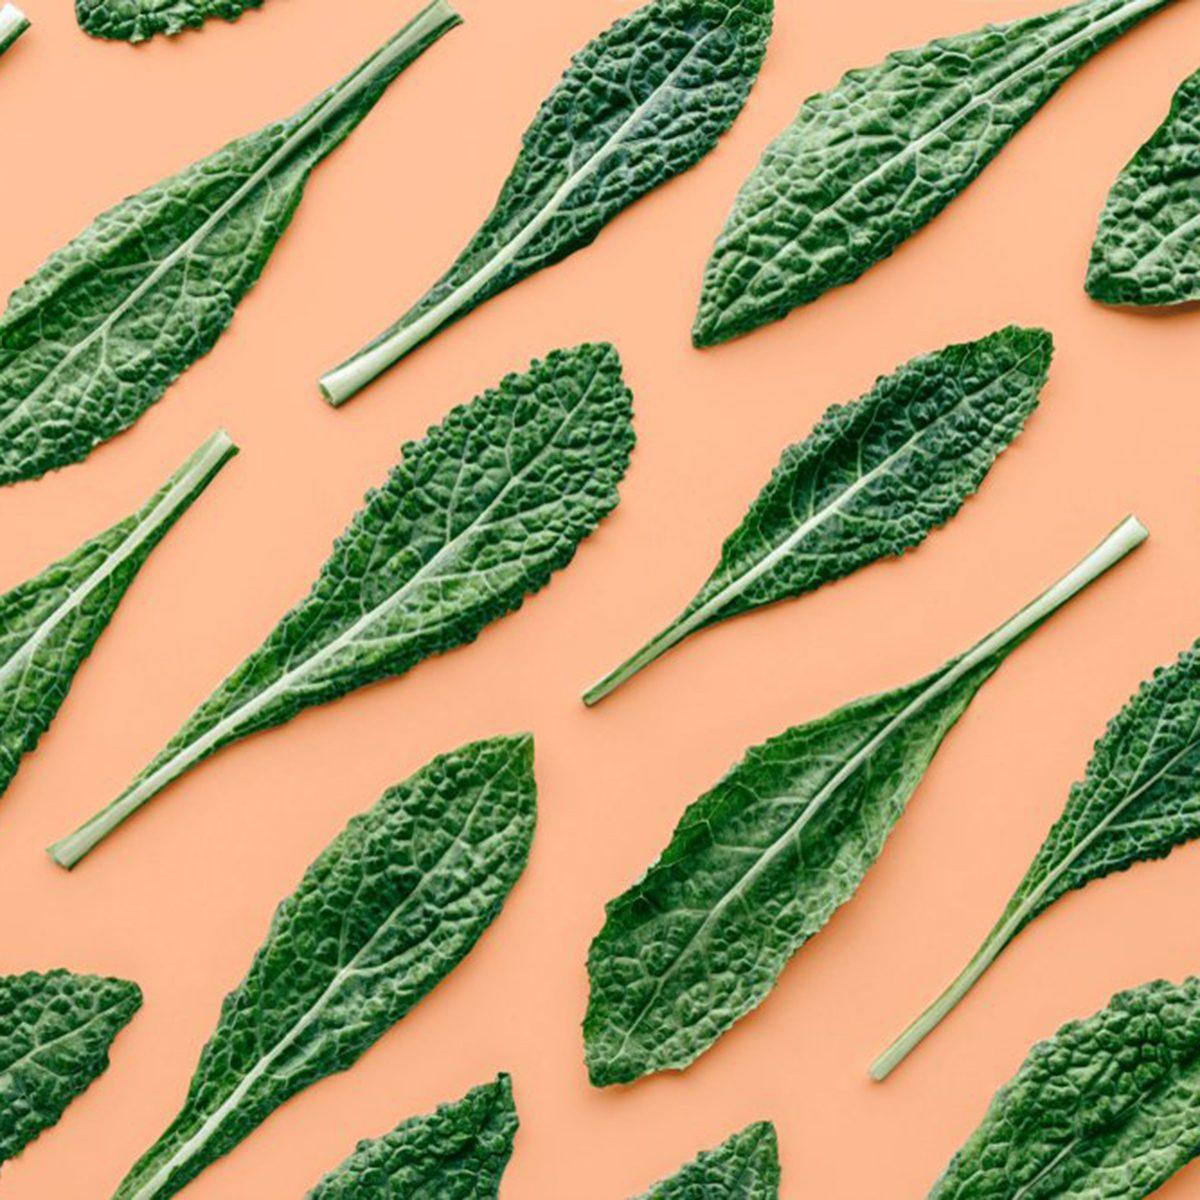 Kale leaves on an orange background